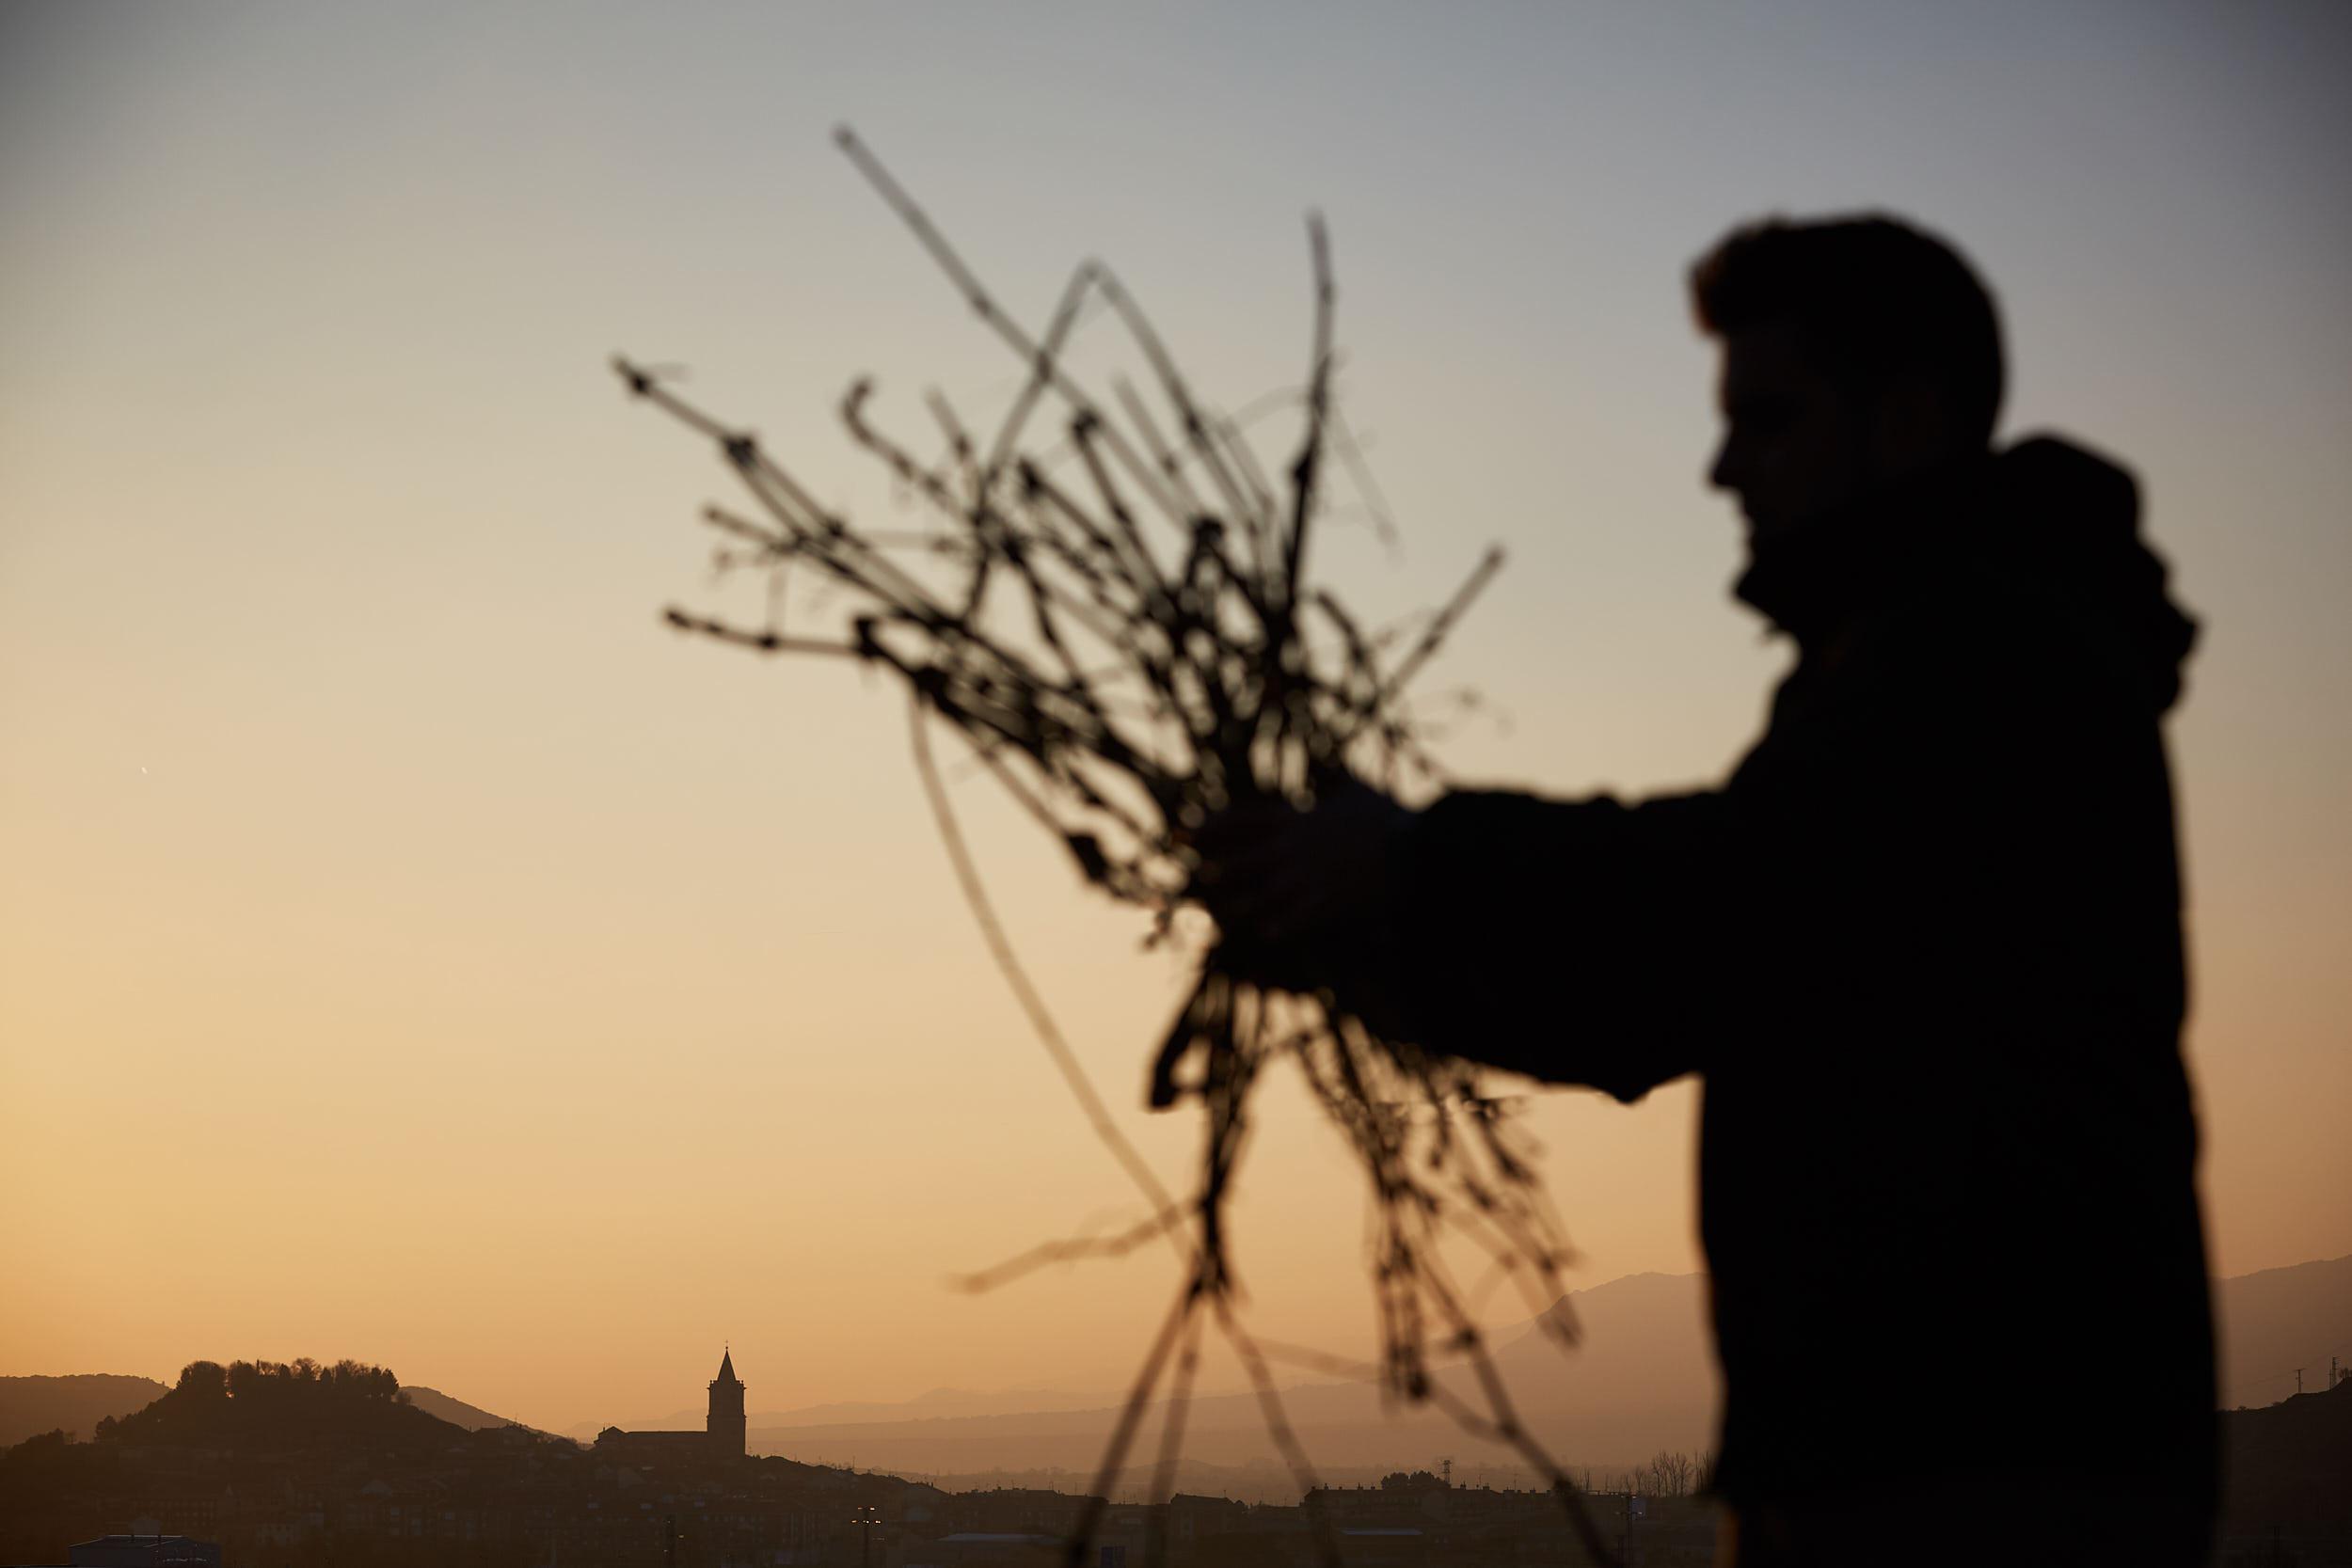 1802Basque_Country_Rioja_Spain_Wine_Photographer_James_Sturcke_0031.jpg